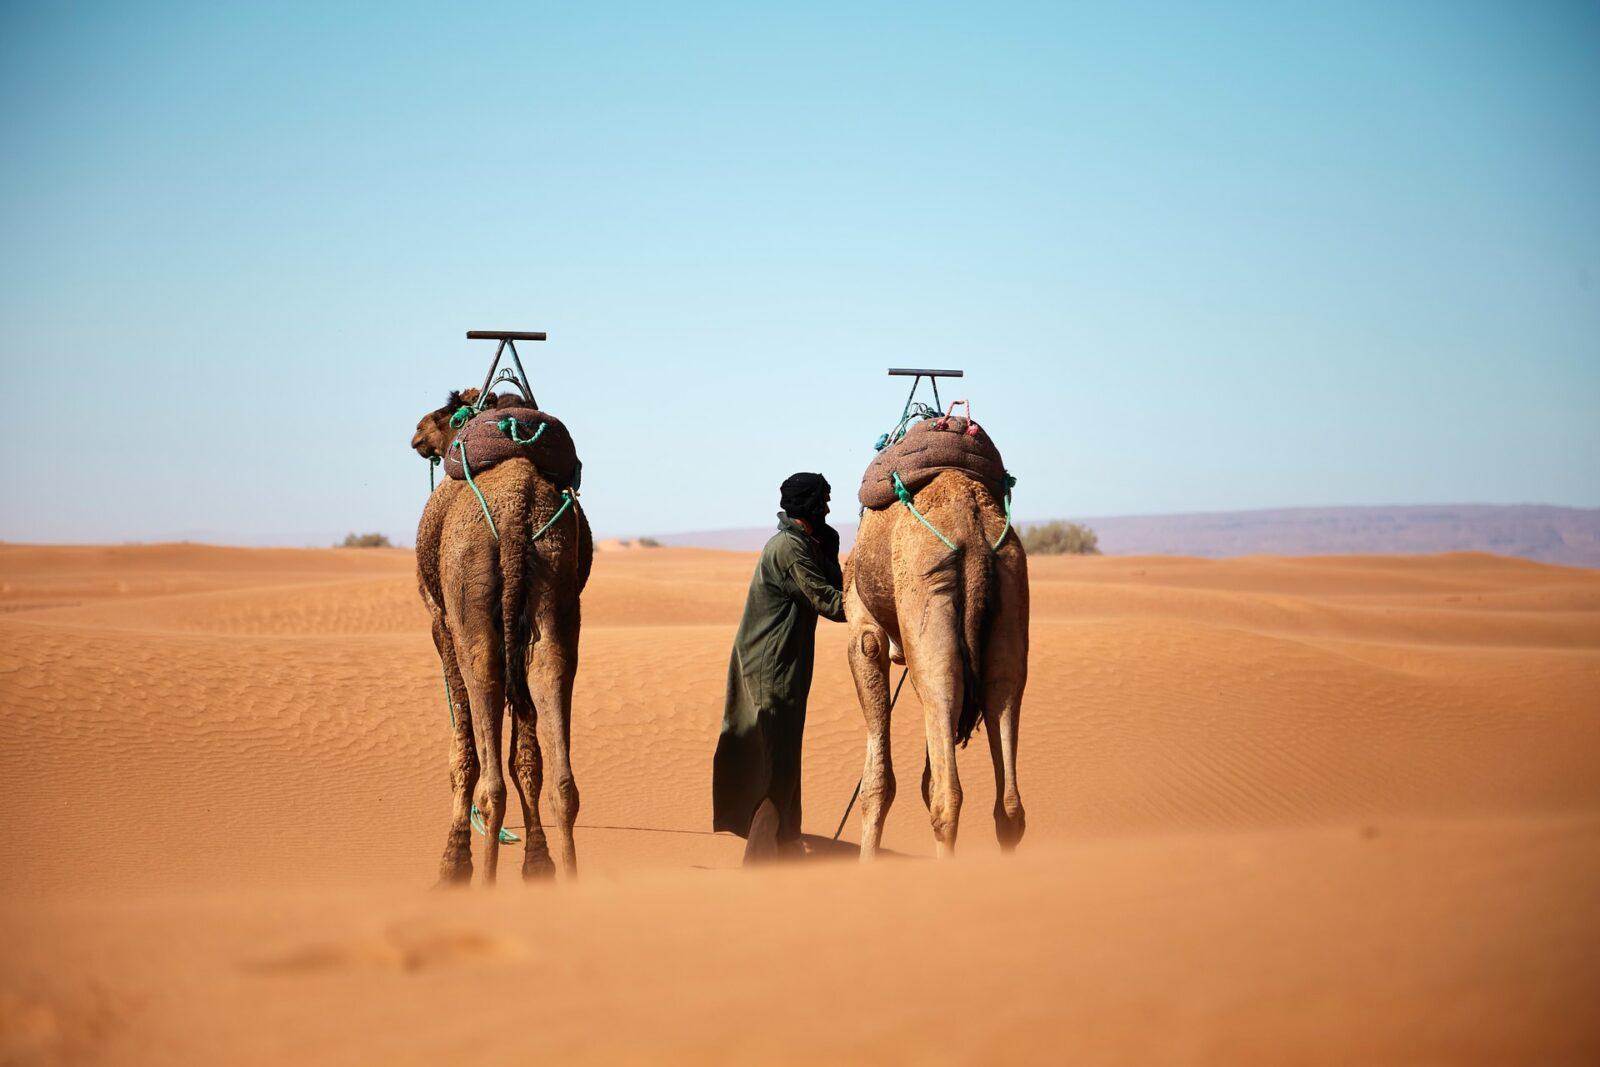 fabien bazanegue 1Lw1ZSRPm7o unsplash 1 1536x1024 - Guide Morocco Tours